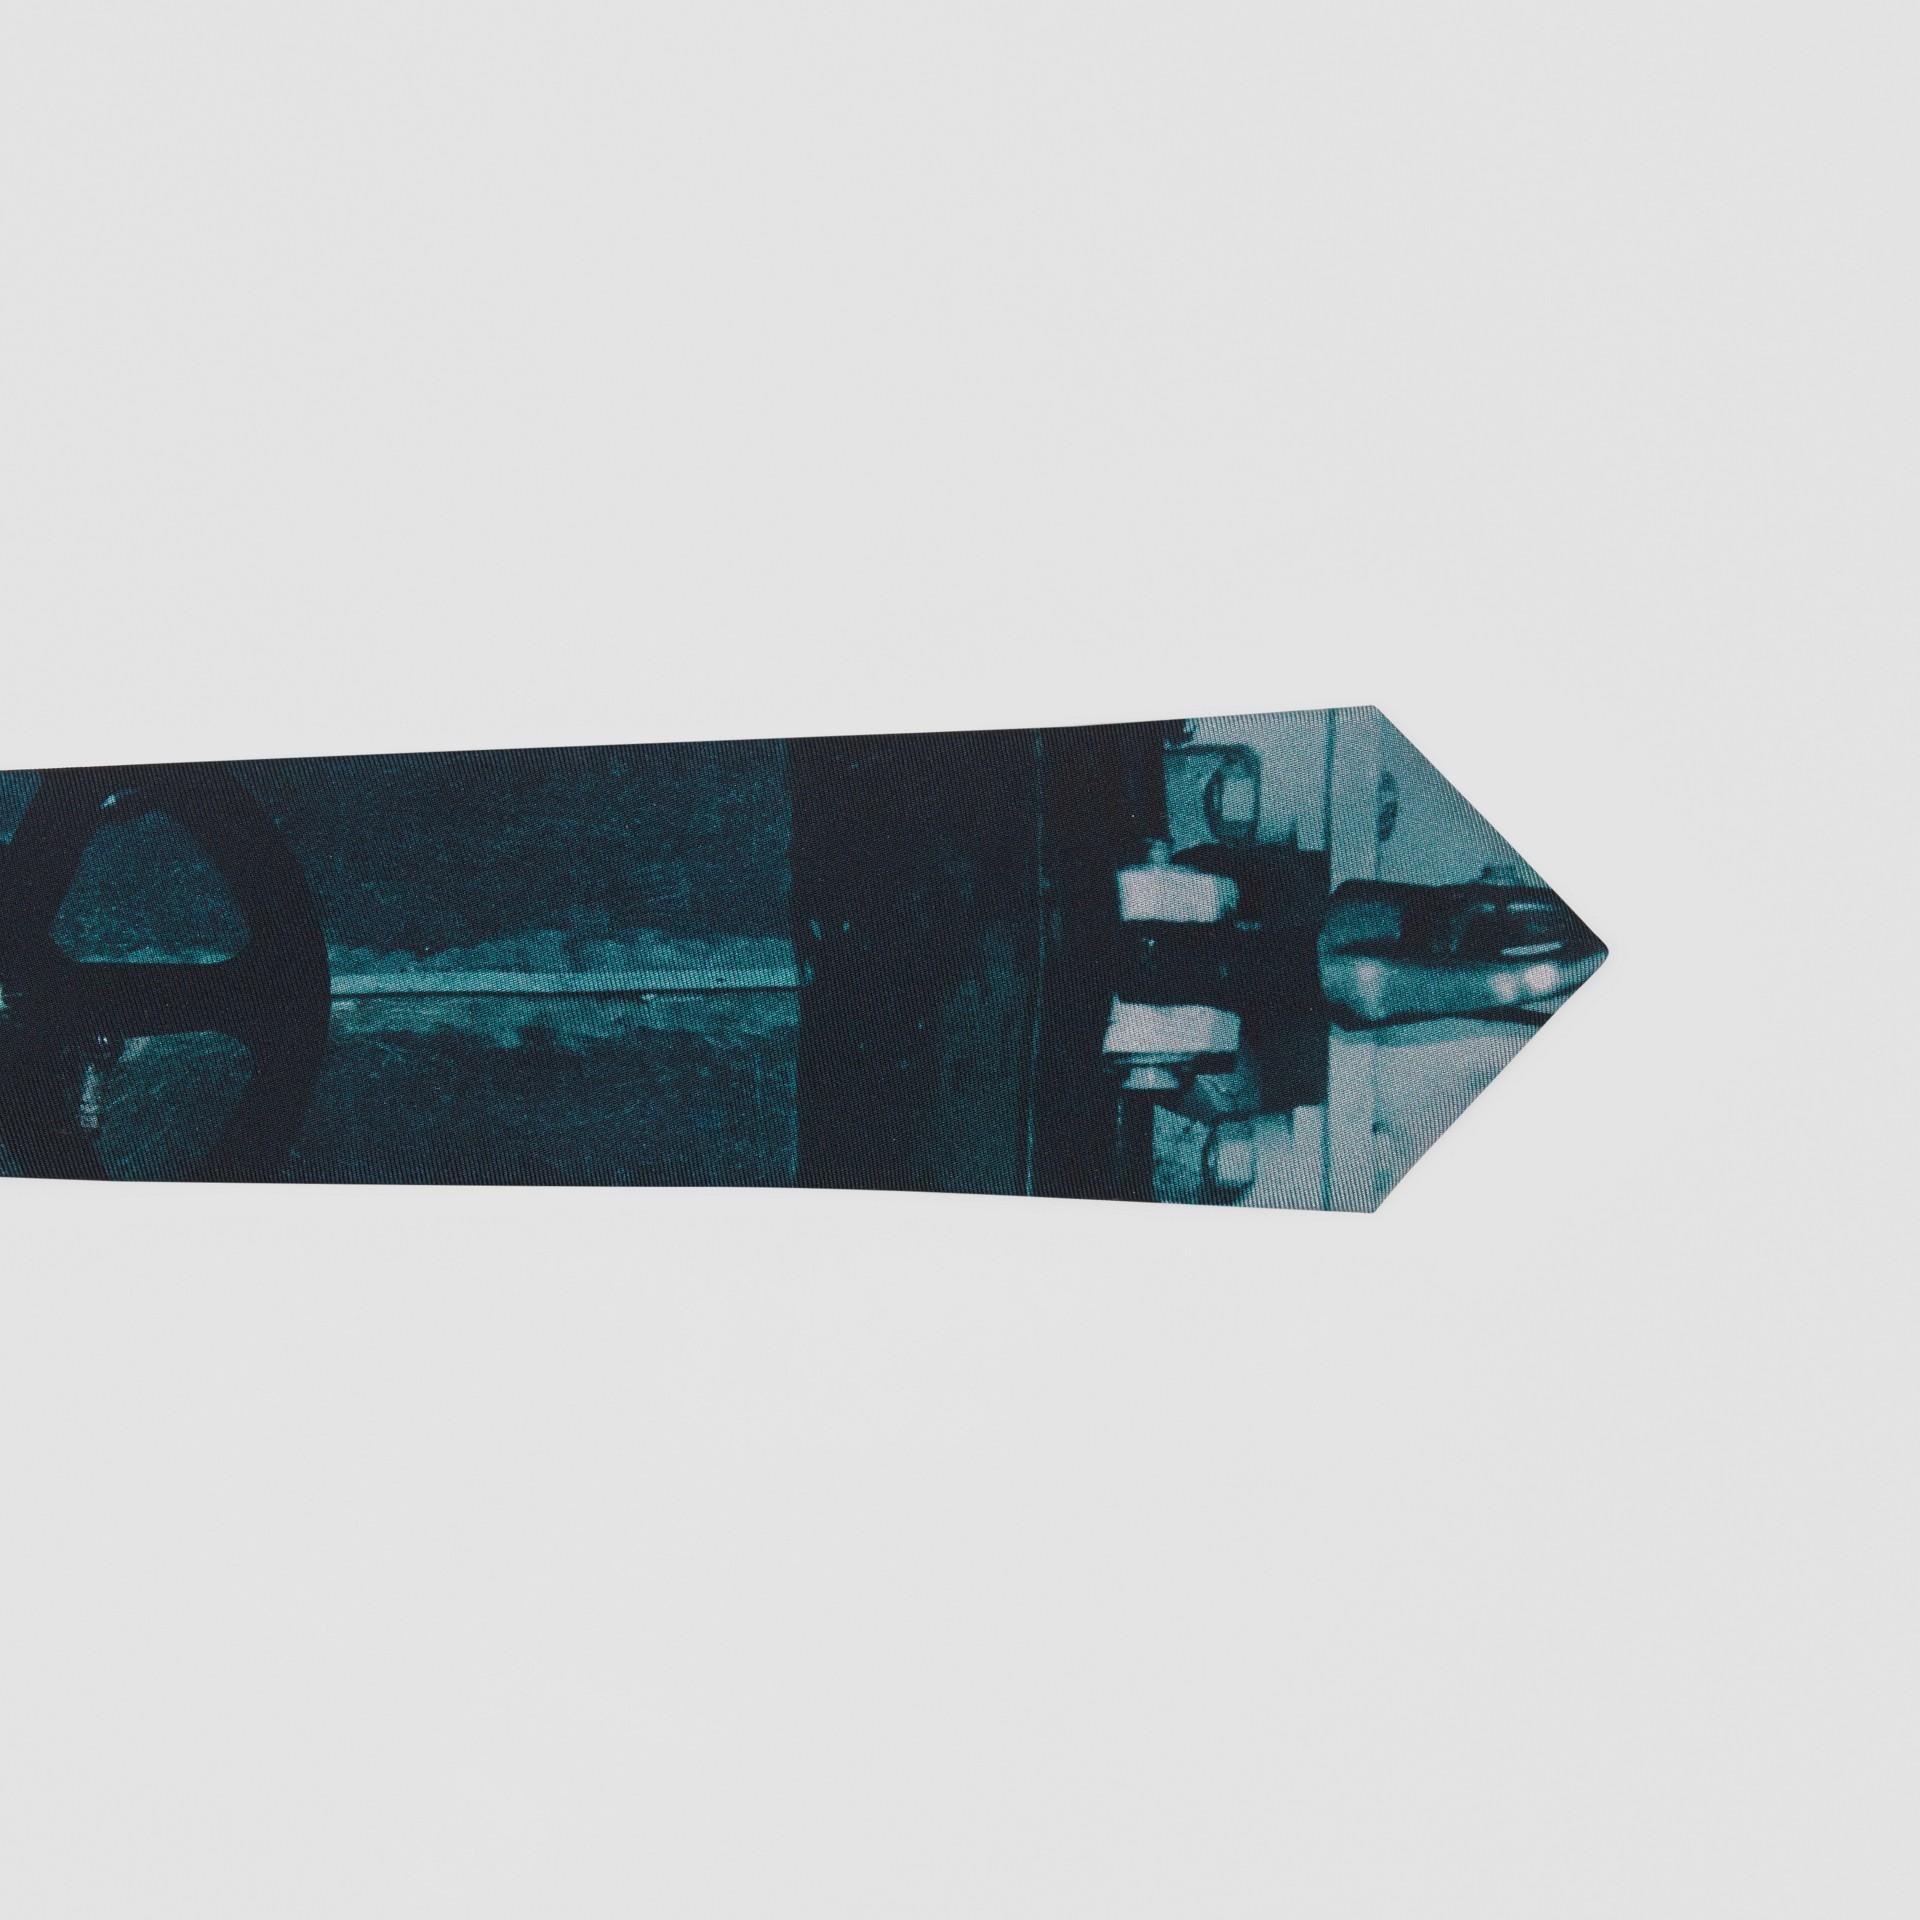 Classic Cut Submarine Print Silk Tie in Deep Teal - Men | Burberry Australia - gallery image 1